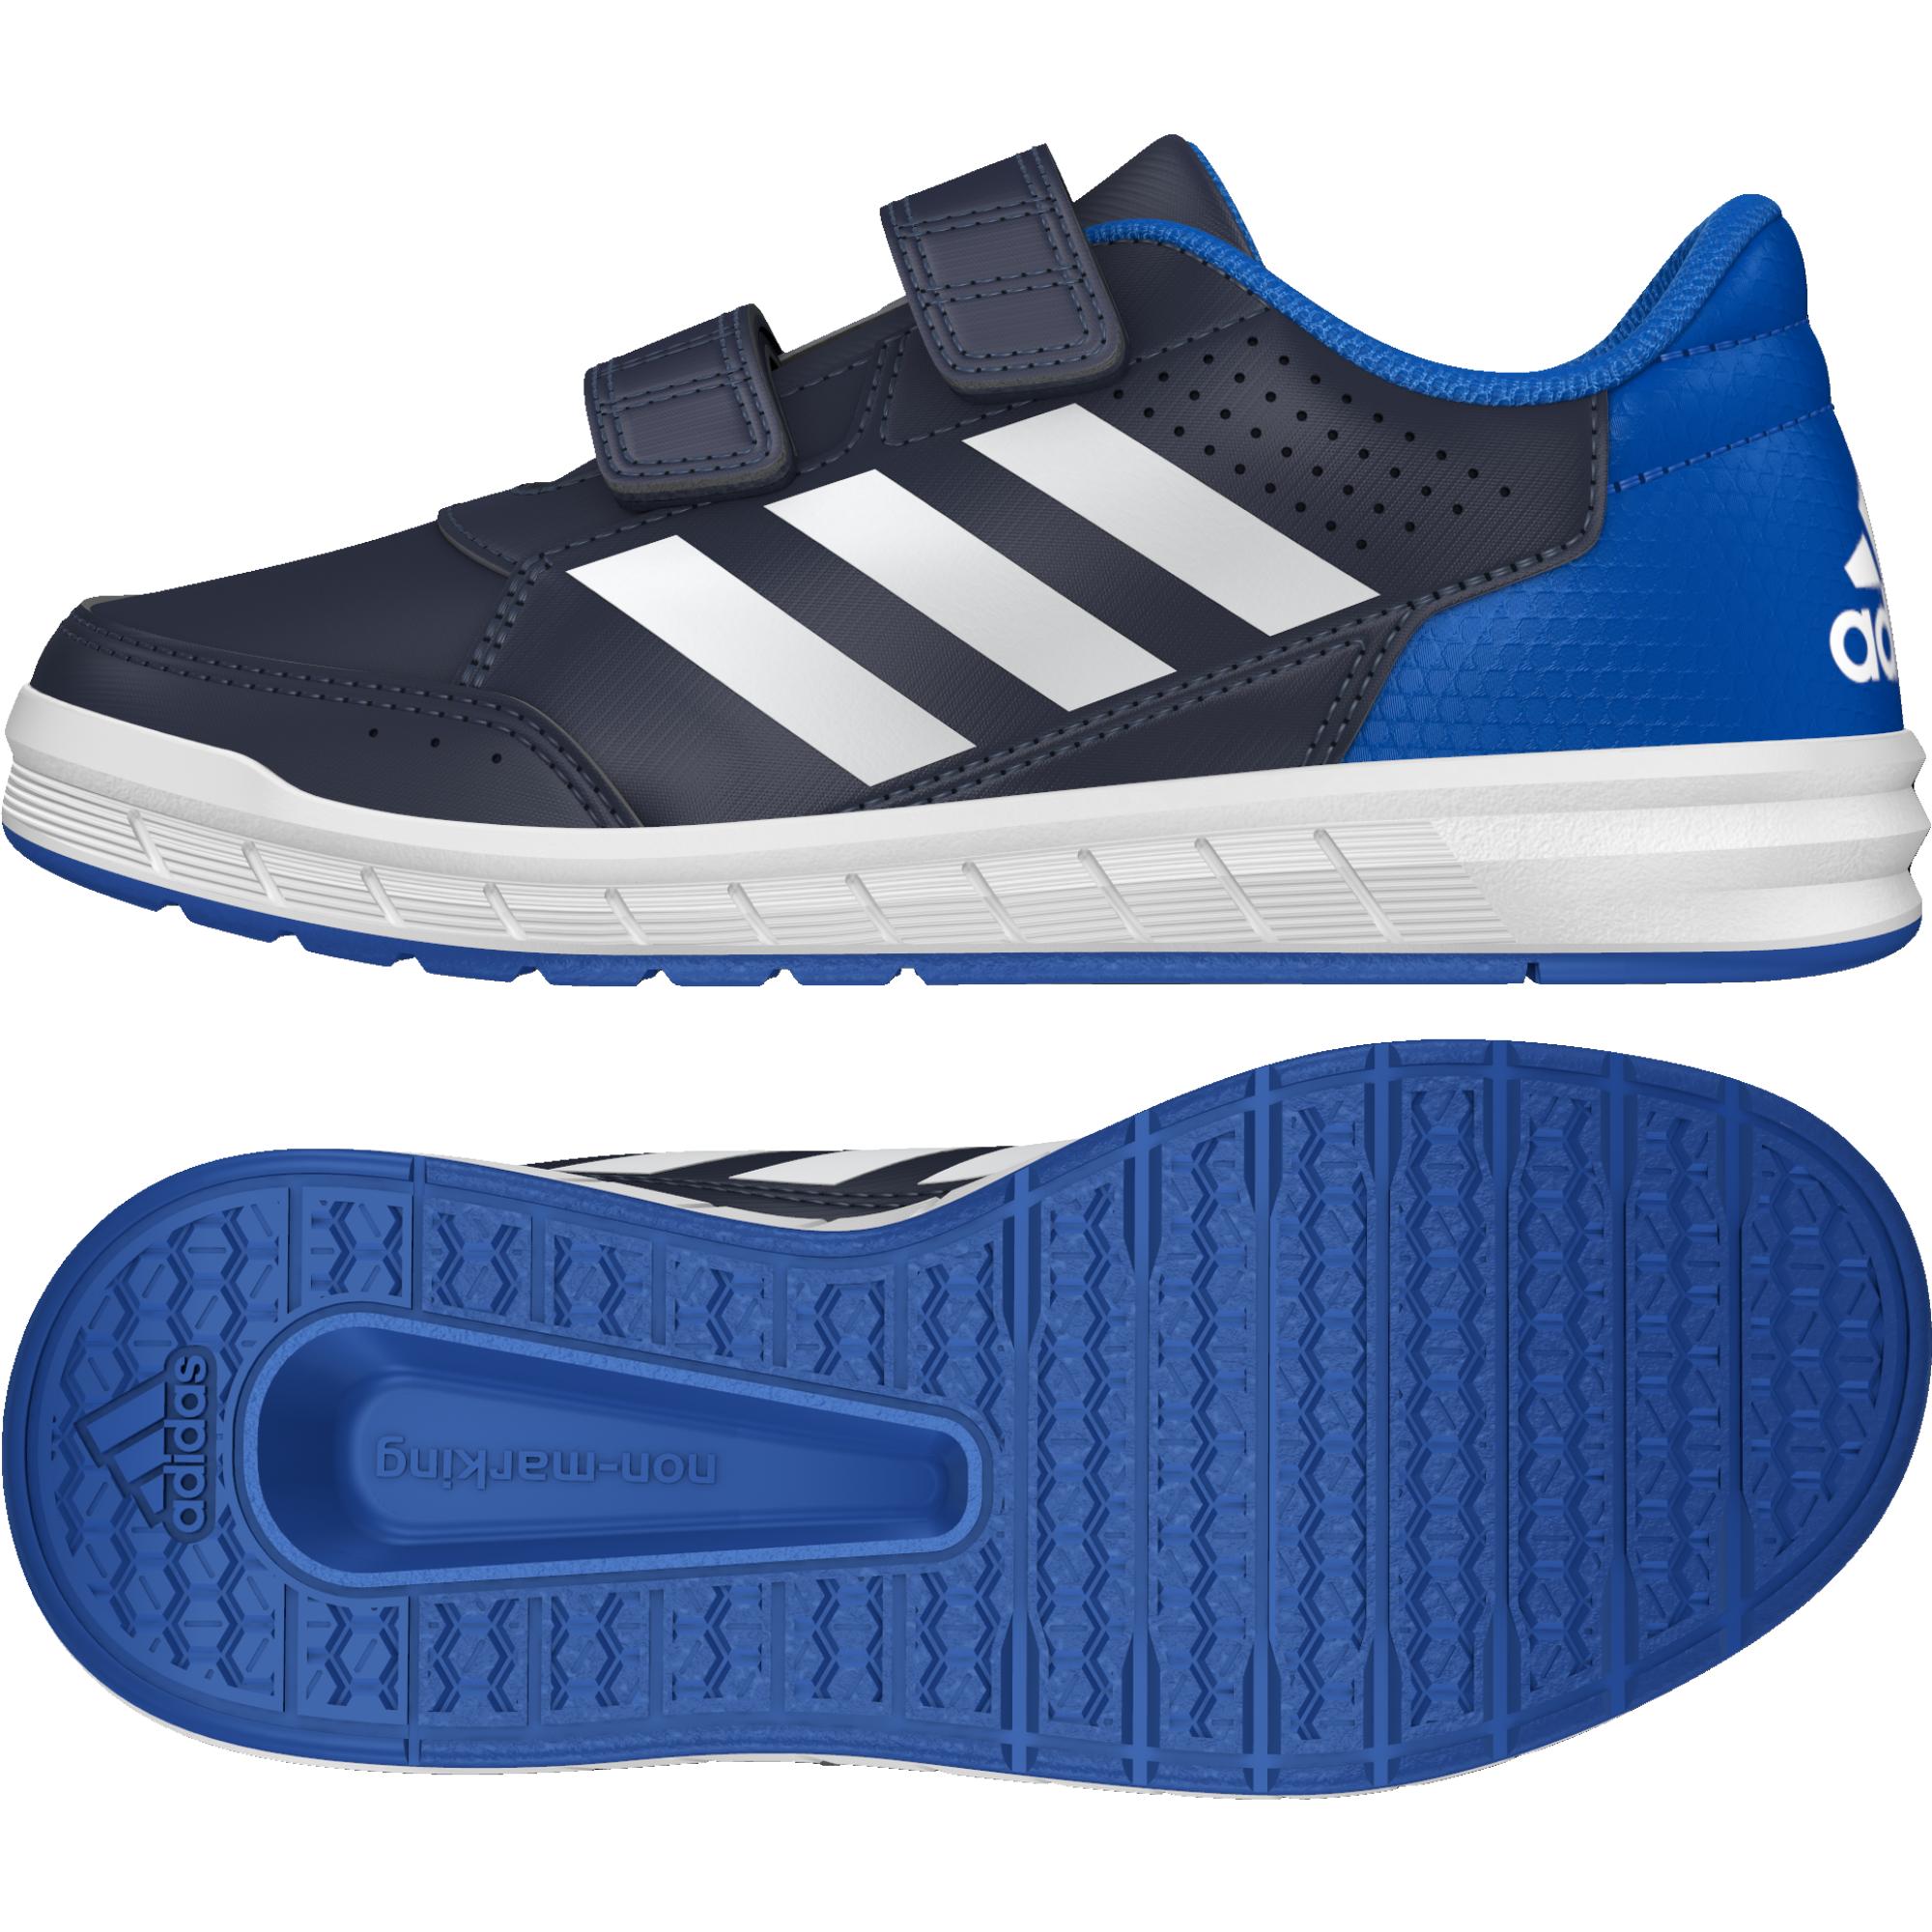 8c804a75ae Adidas AltaSport Cf K kisfiú futócipő , Fiú Gyerek cipő | futócipő |  adidas_performance | Adidas AltaSport Cf K kisfiú futócipő